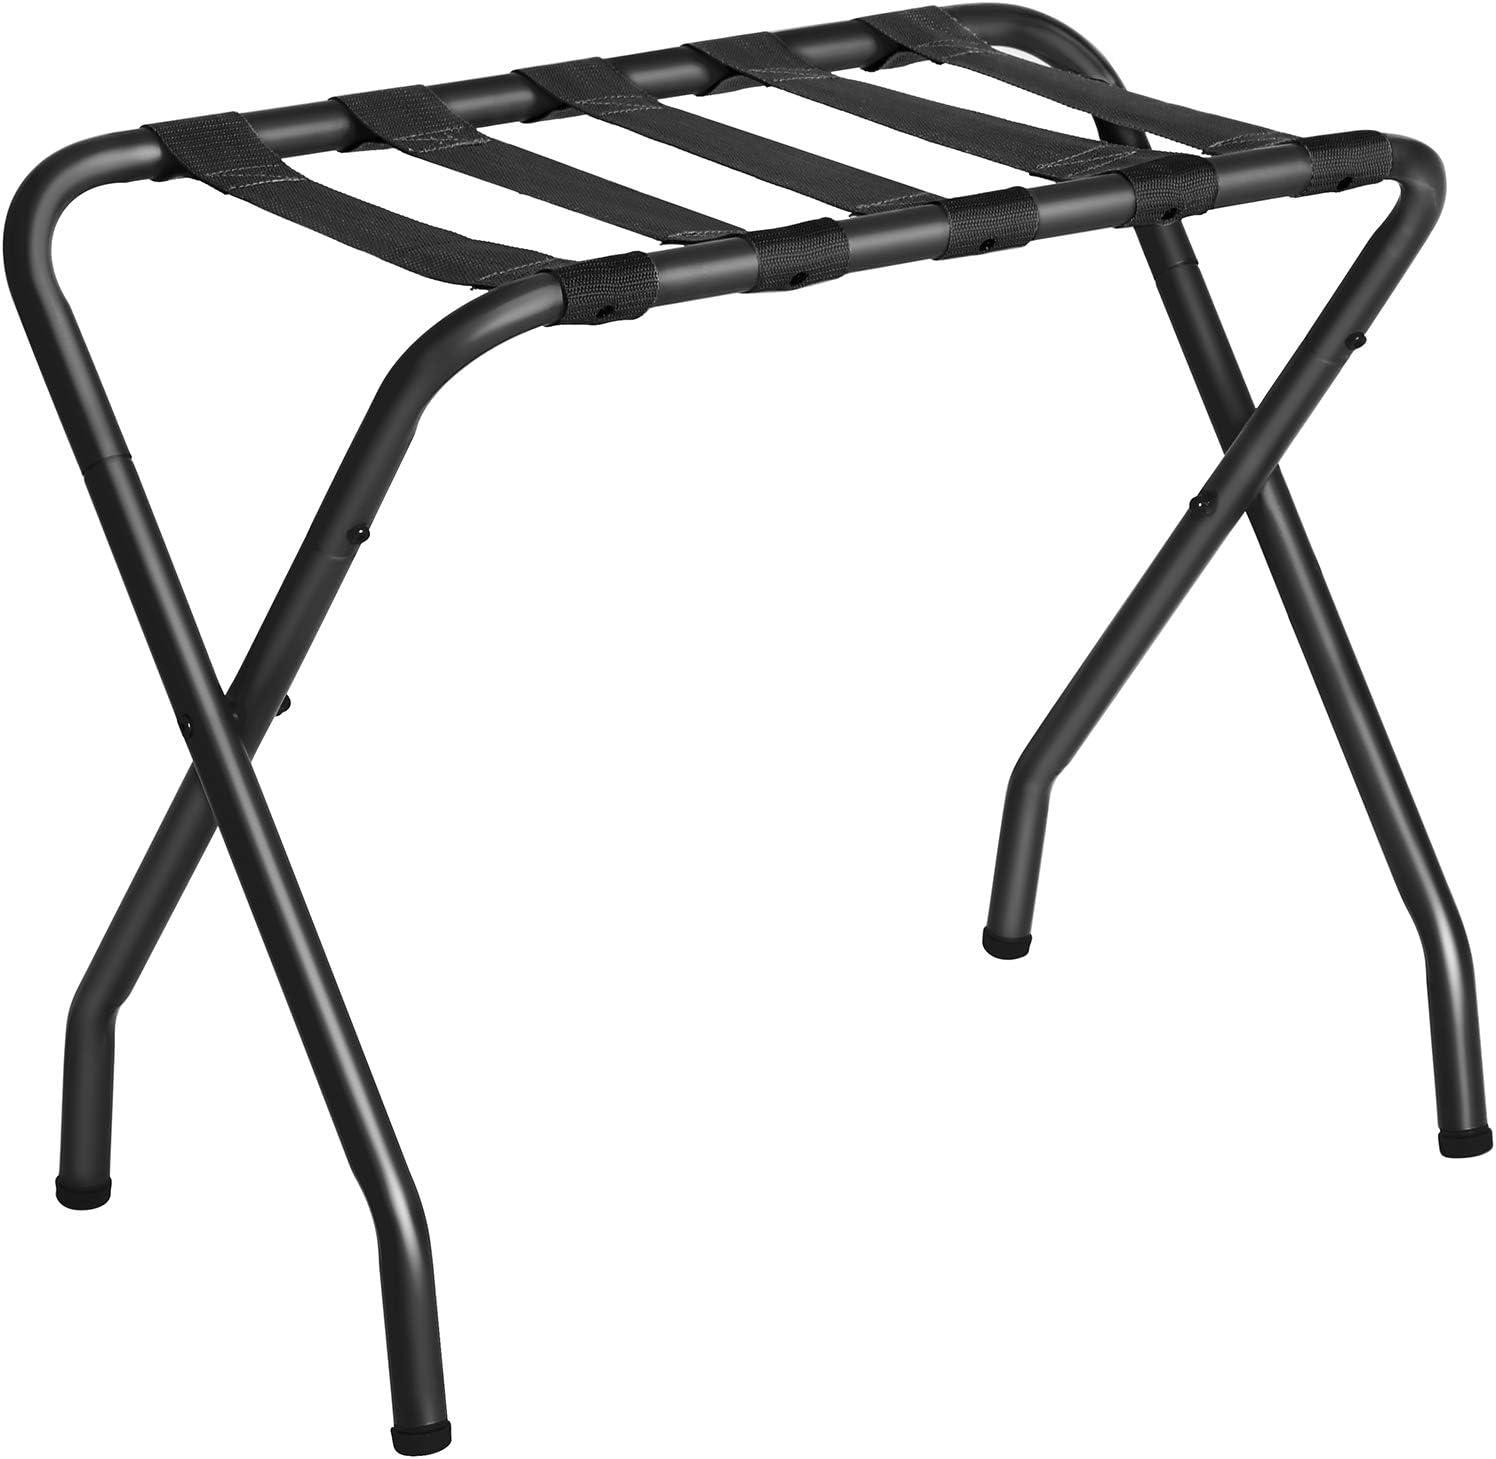 Amazon Com Songmics Metal Folding Luggage Rack Black Urlr64b Home Kitchen